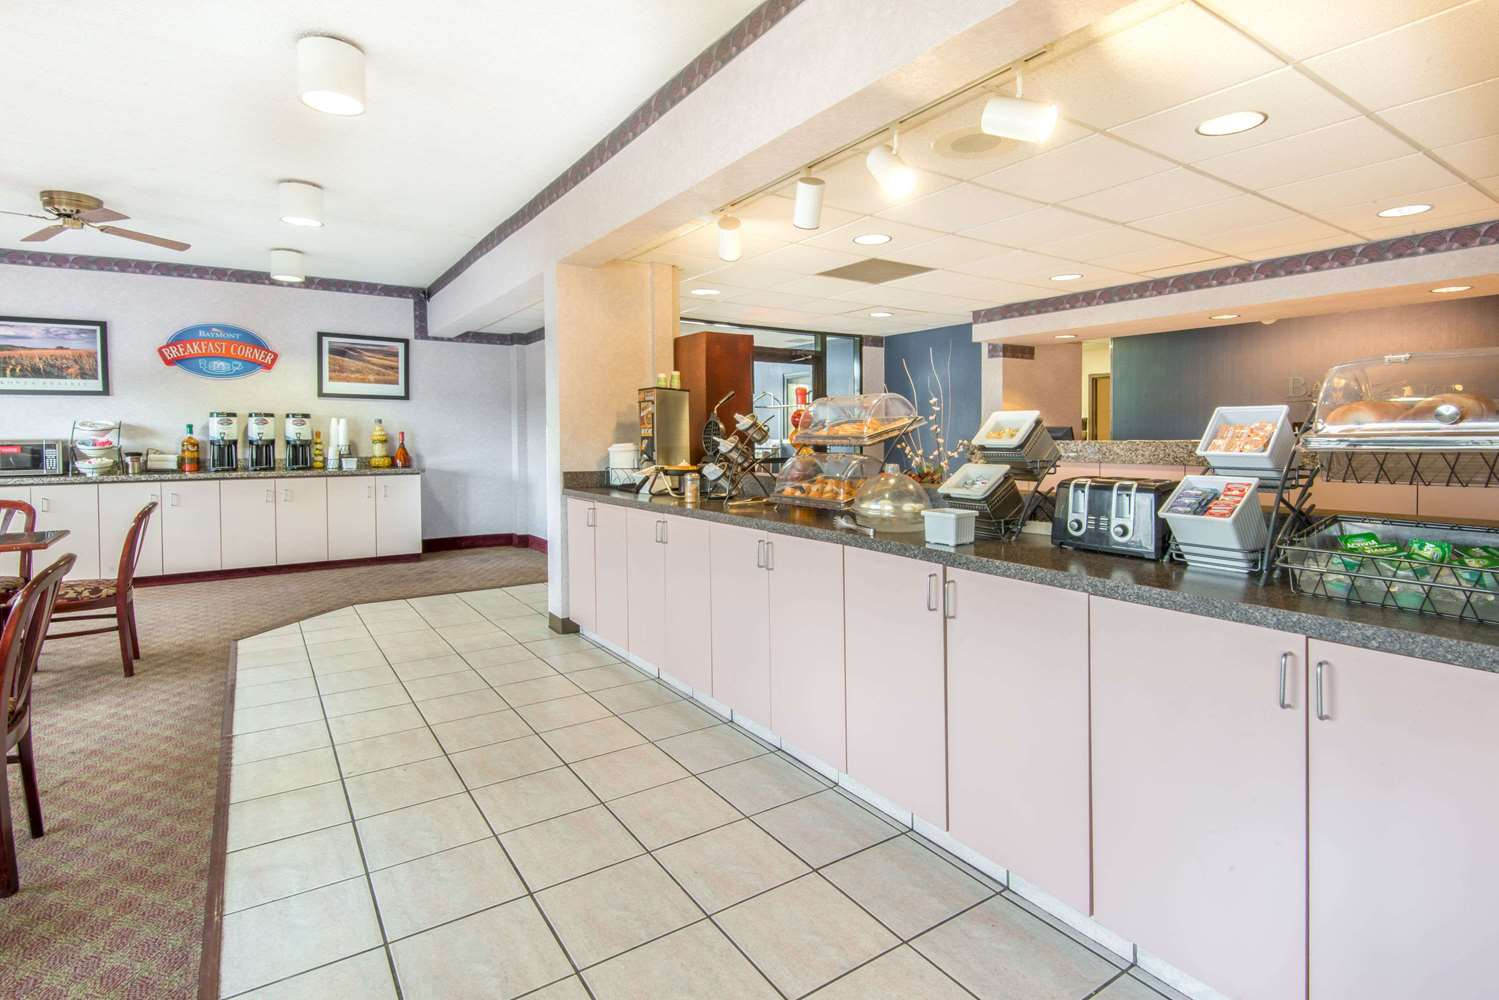 proam - Baymont Inn & Suites Topeka